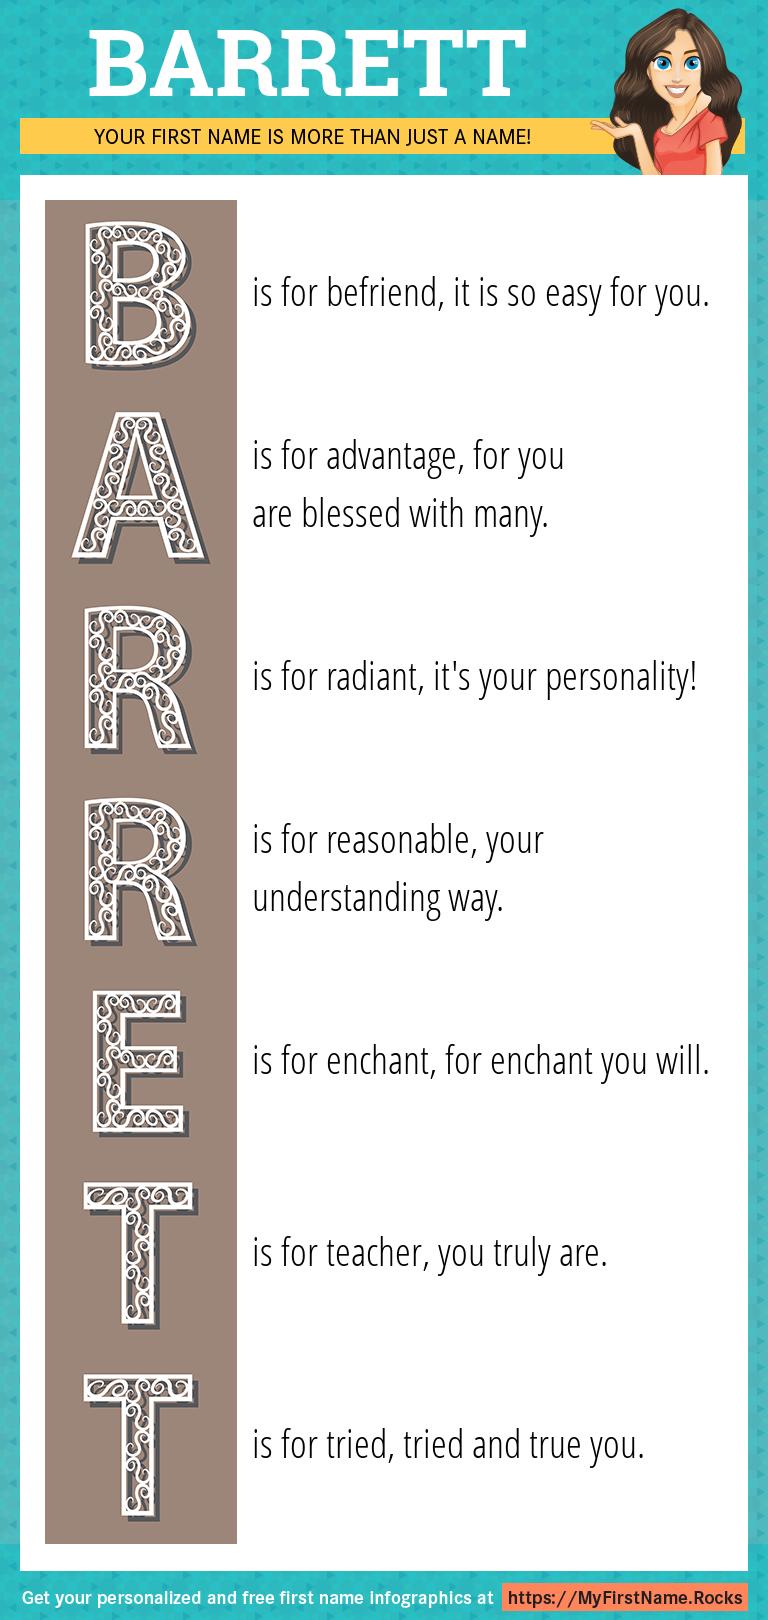 Barrett Infographics